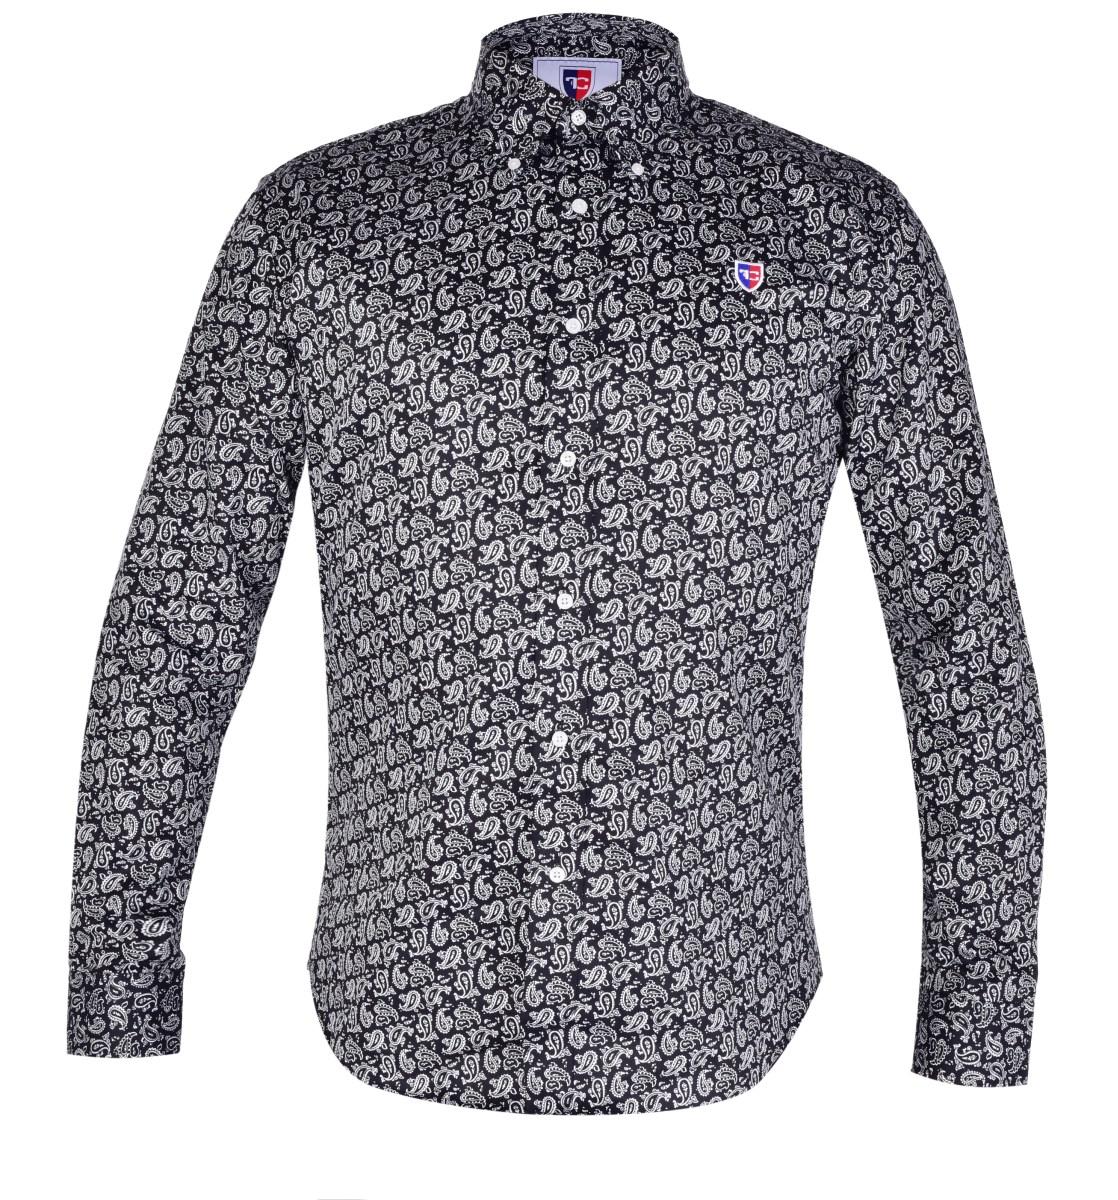 KENT DENSEFORSÉ® košile slim fit s dlouhým rukávem black with ornaments L